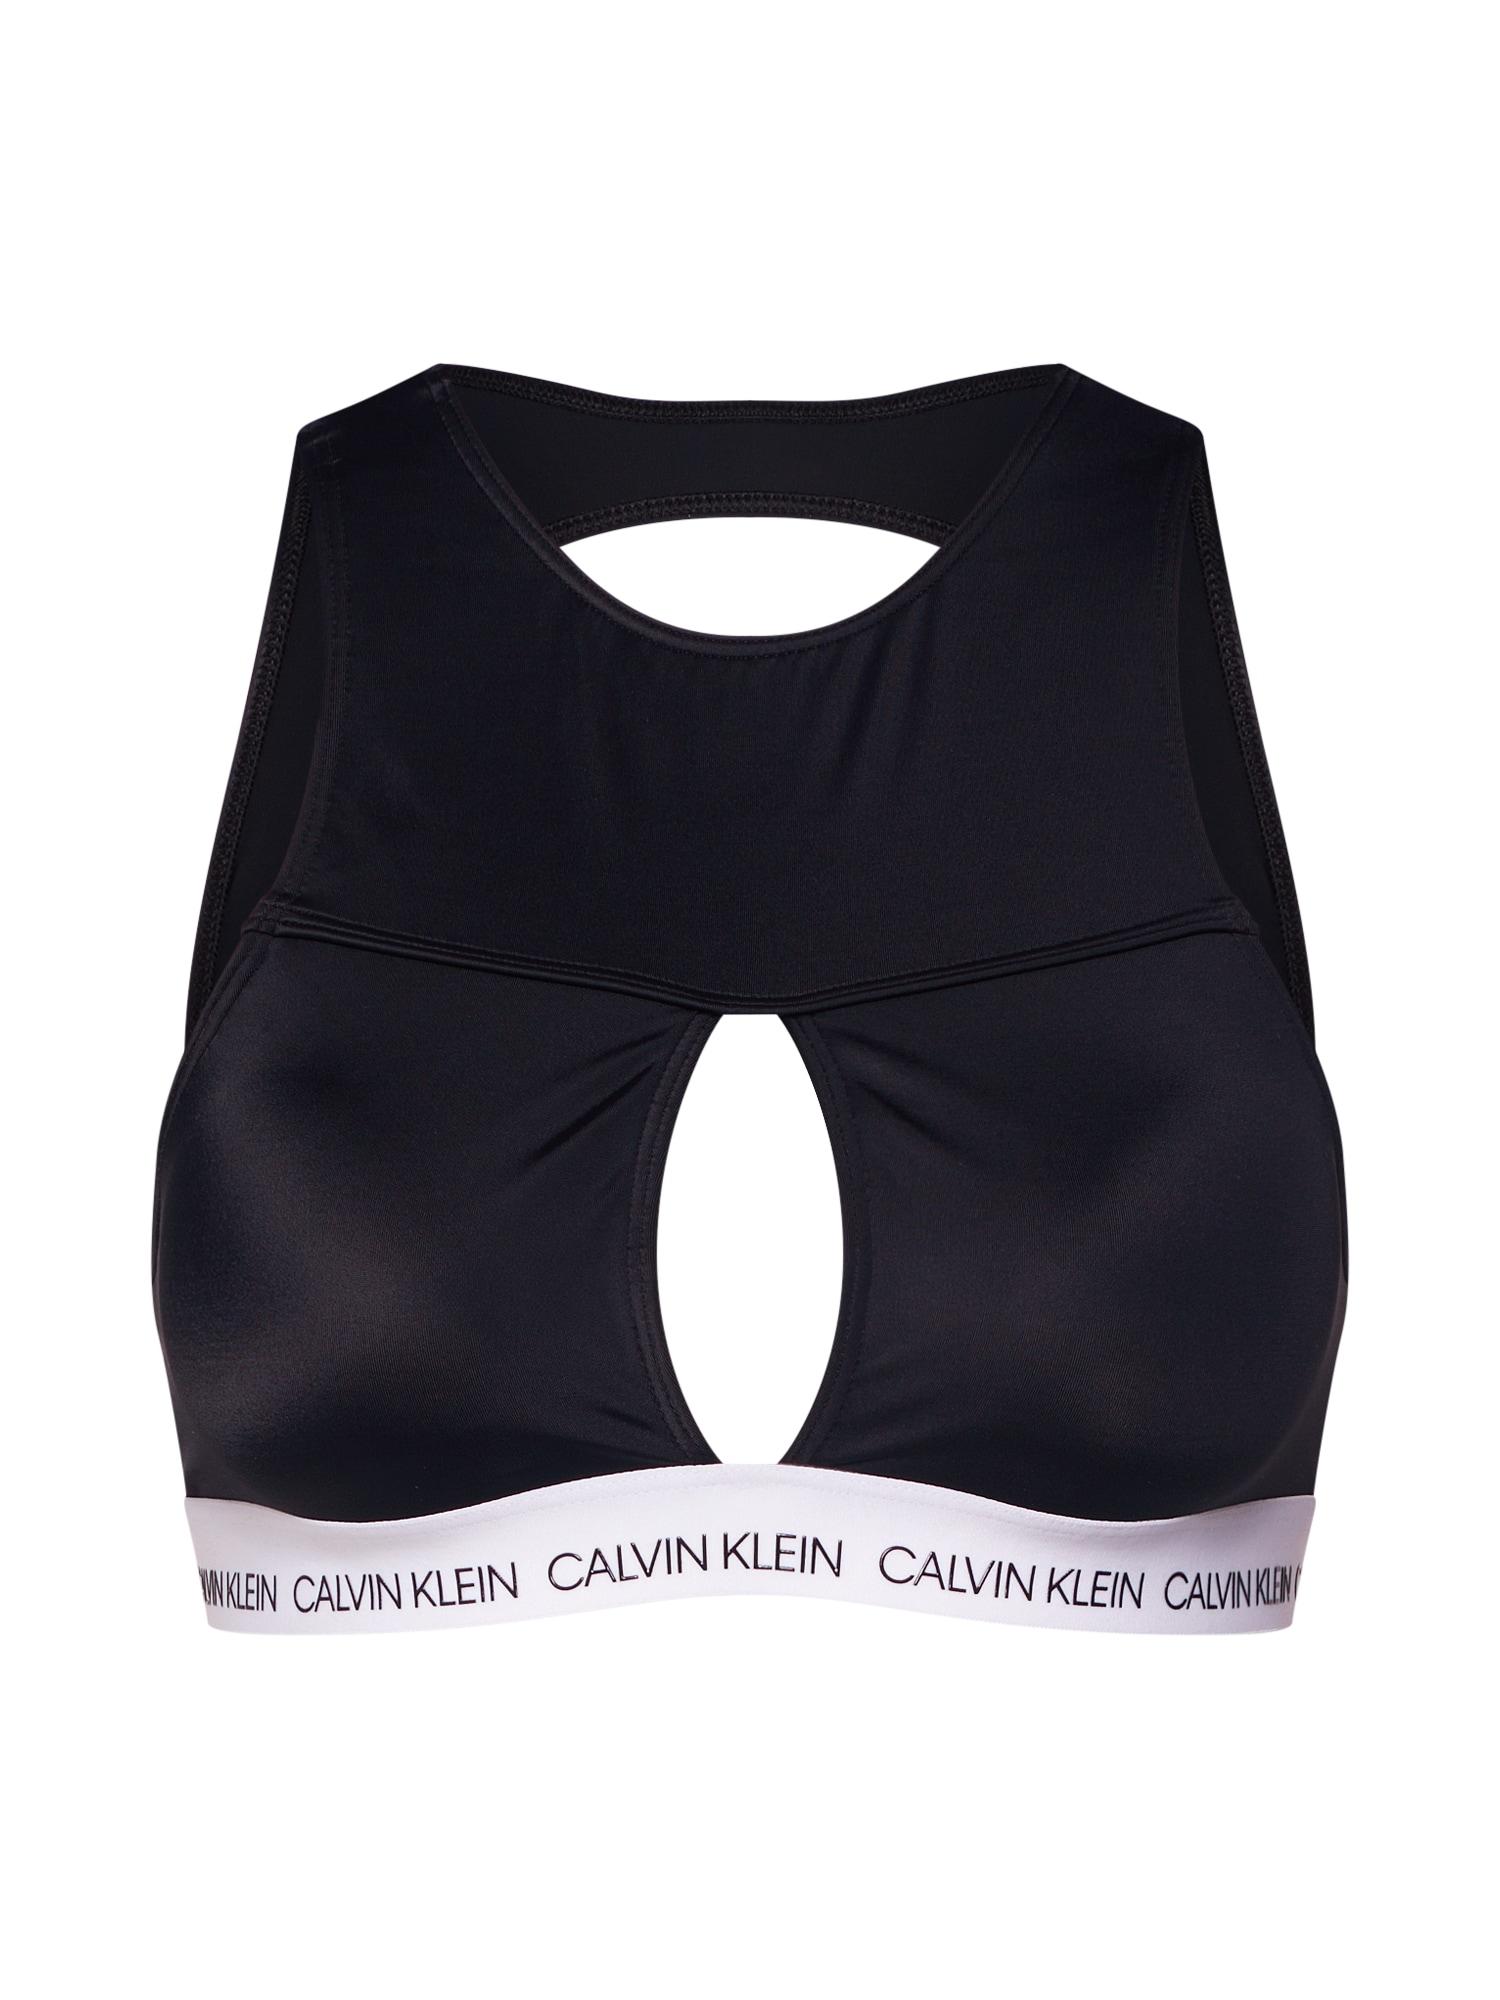 Horní díl plavek OPEN SQUARE CROP TOP černá bílá Calvin Klein Swimwear